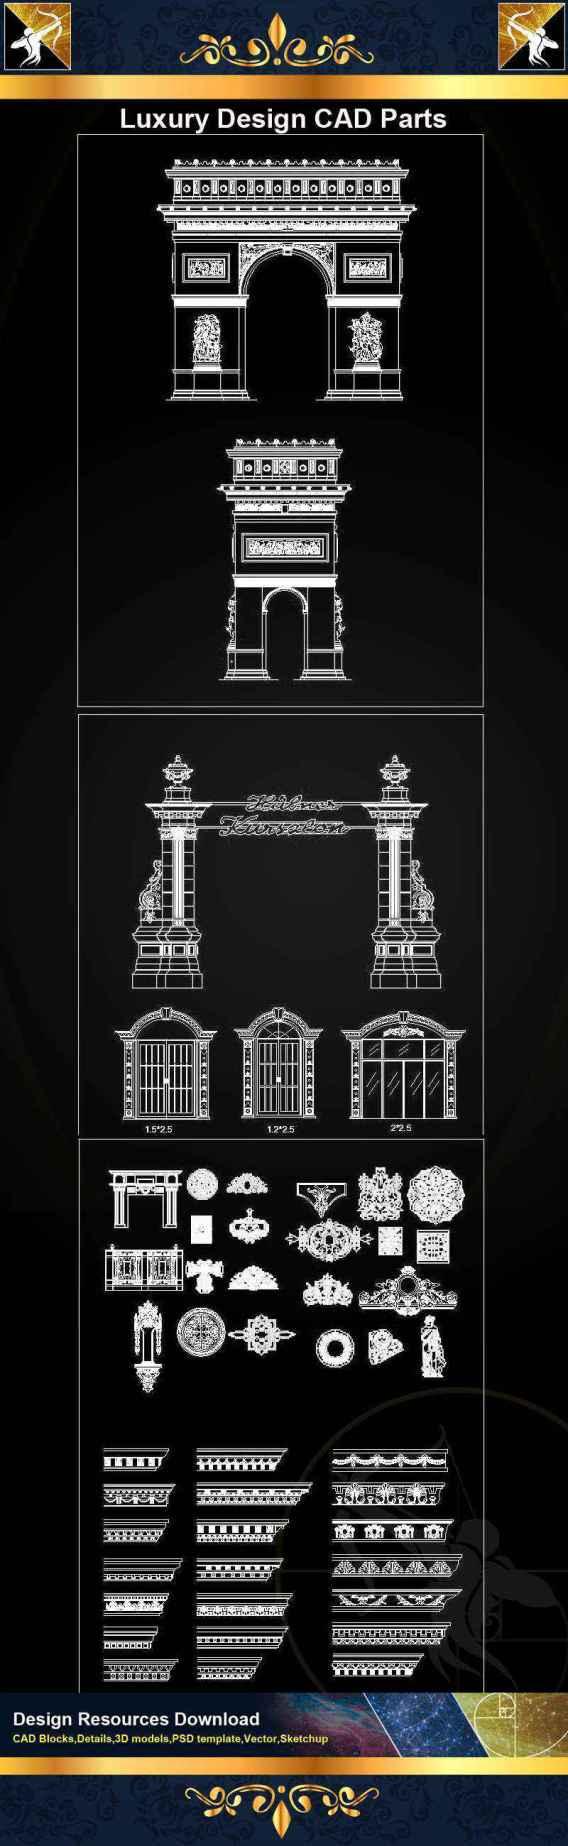 A05 Luxury Design CAD Blocks